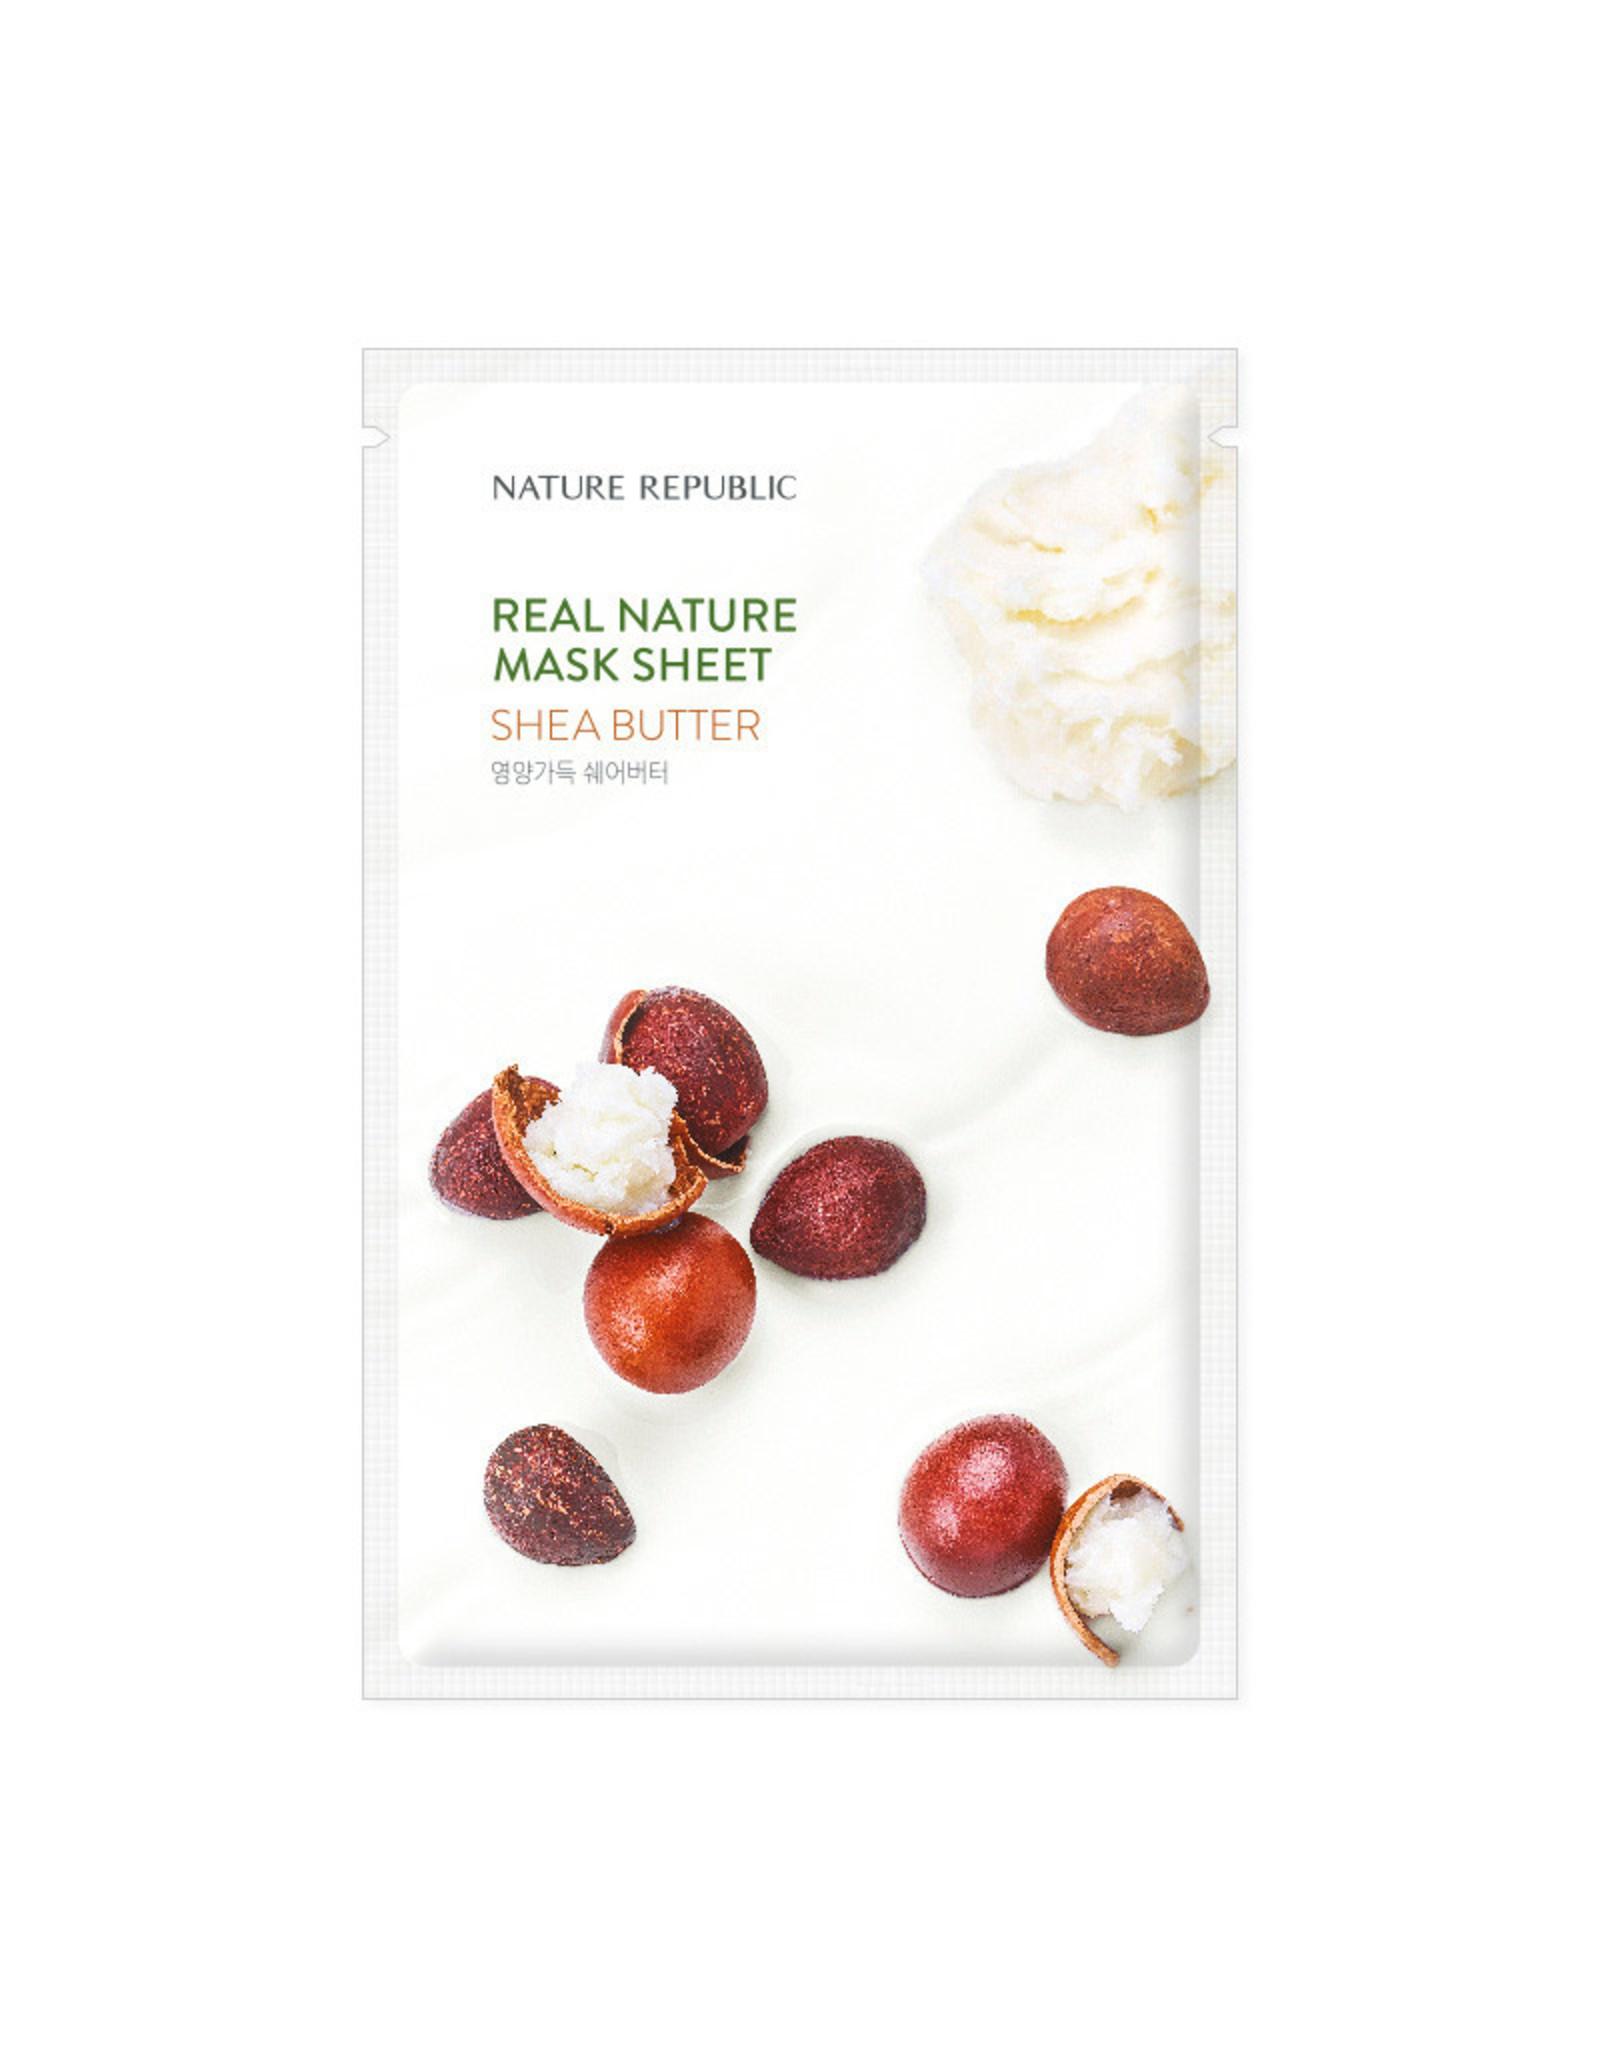 Real Nature Shea Butter Mask Sheet (Orig $1.90)